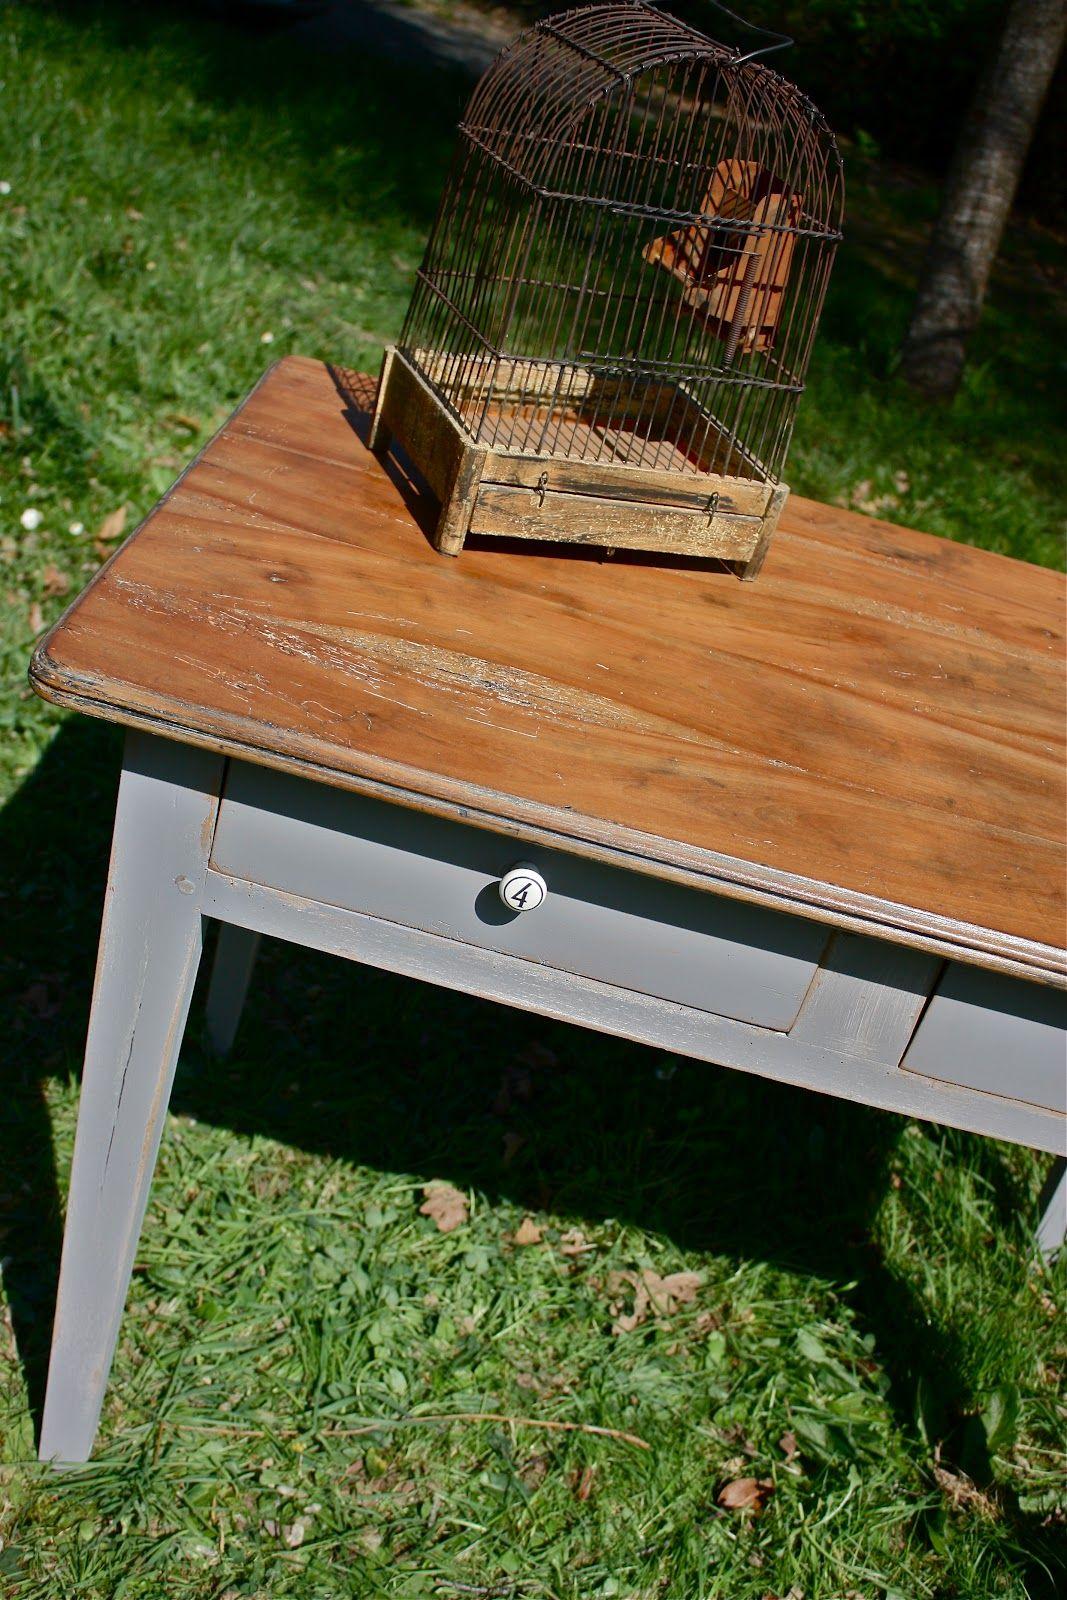 restauration petite table ancienne patine gris bois brut relooking meuble diy petitb. Black Bedroom Furniture Sets. Home Design Ideas